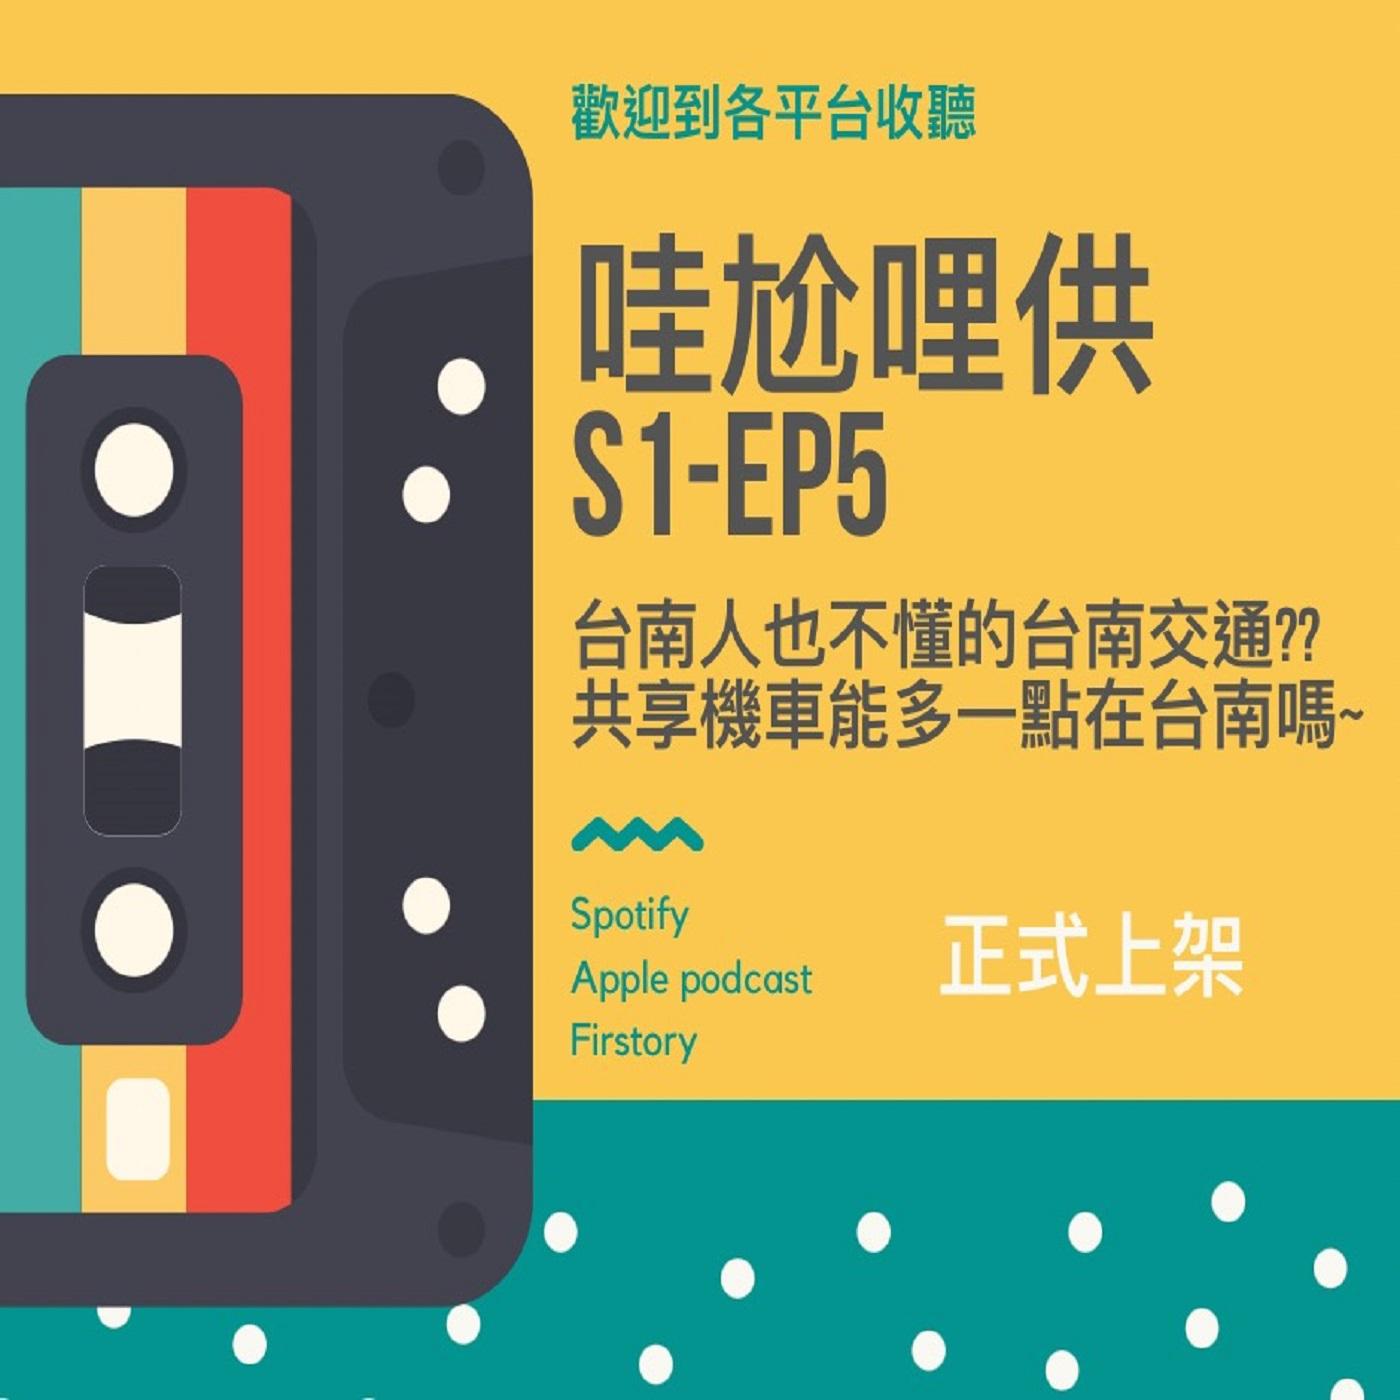 【S1|北漂南迴】ep.5 台南人也不懂的台南交通???  共享機車能多一點在台南ㄇ